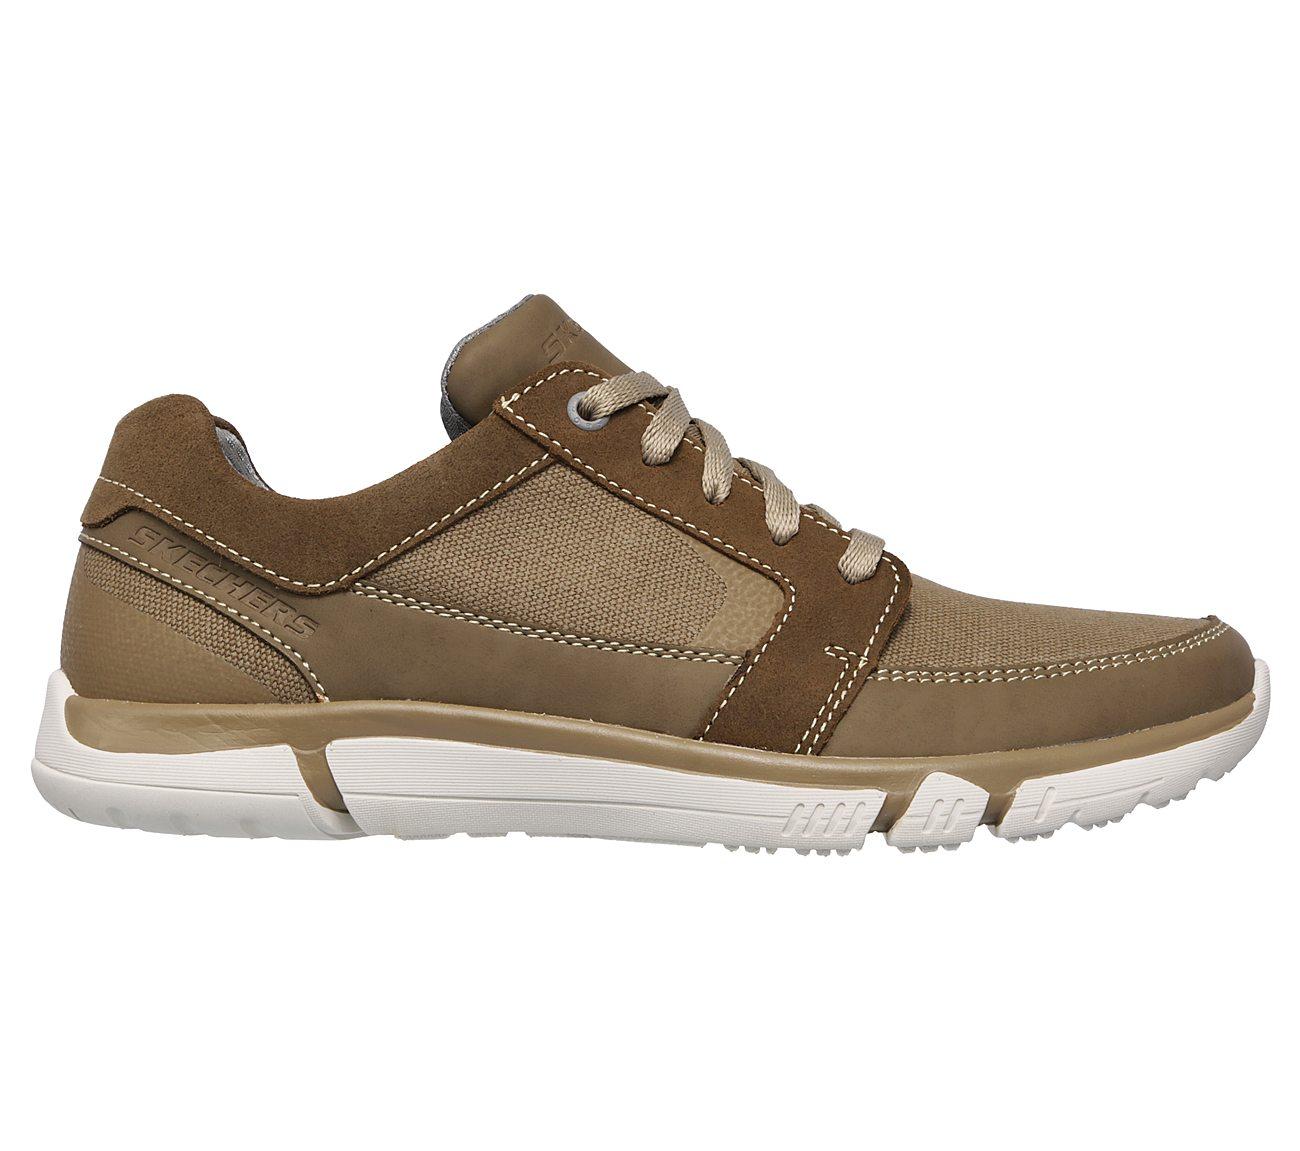 Khaki 'Edmen Ristone' lace up shoes low cost online clearance 2014 unisex outlet new styles gXo8m7